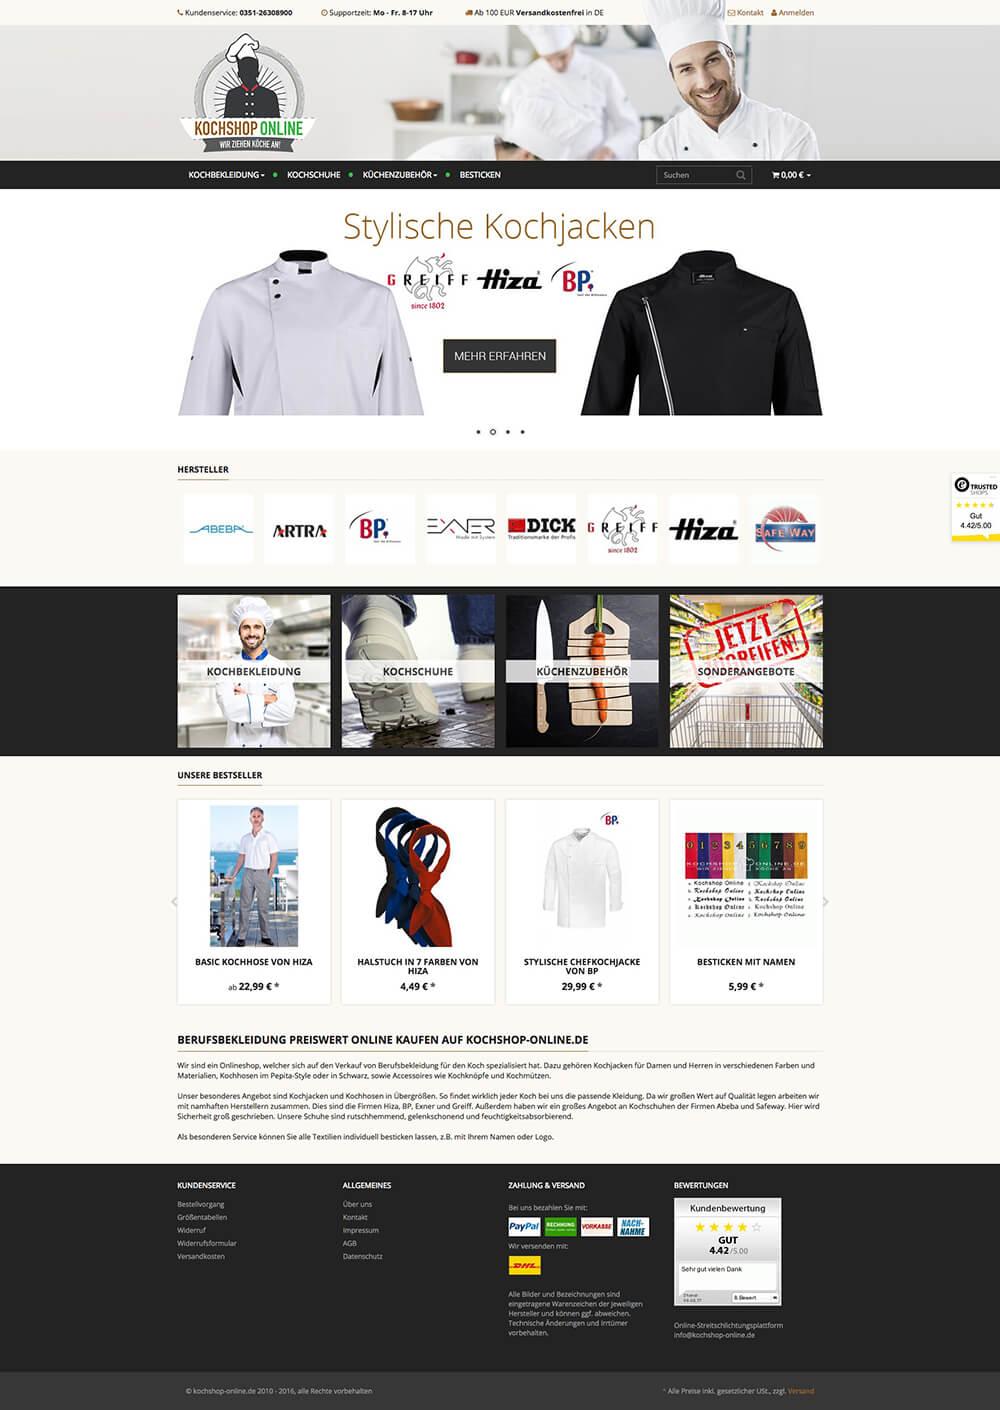 Kochshop Online